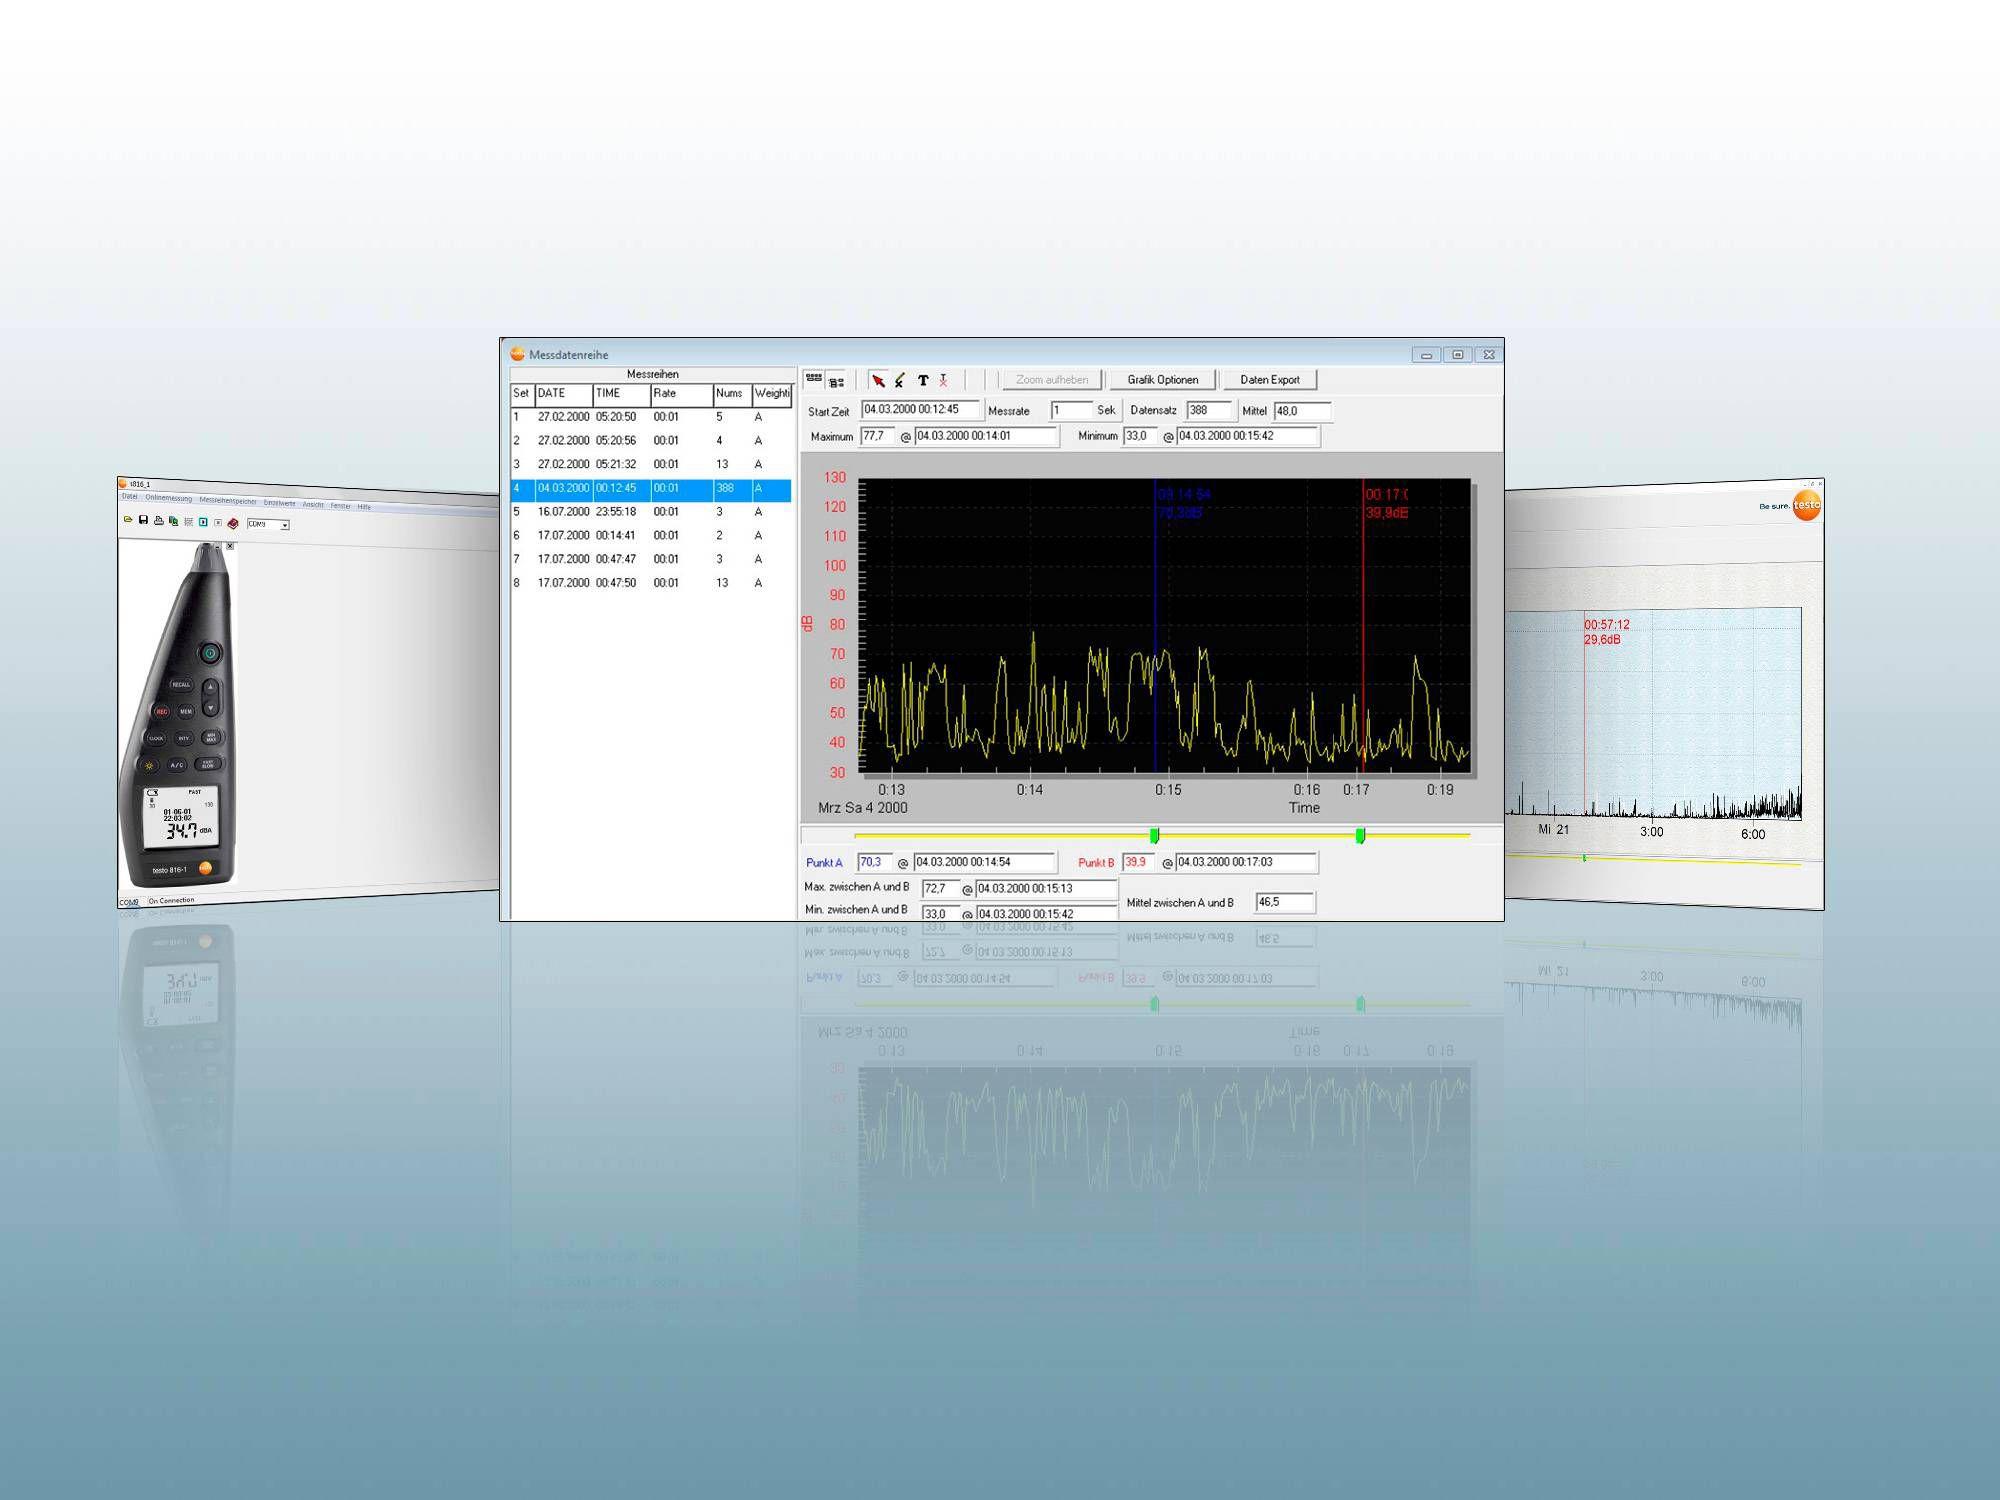 PC-Software testo 816-1